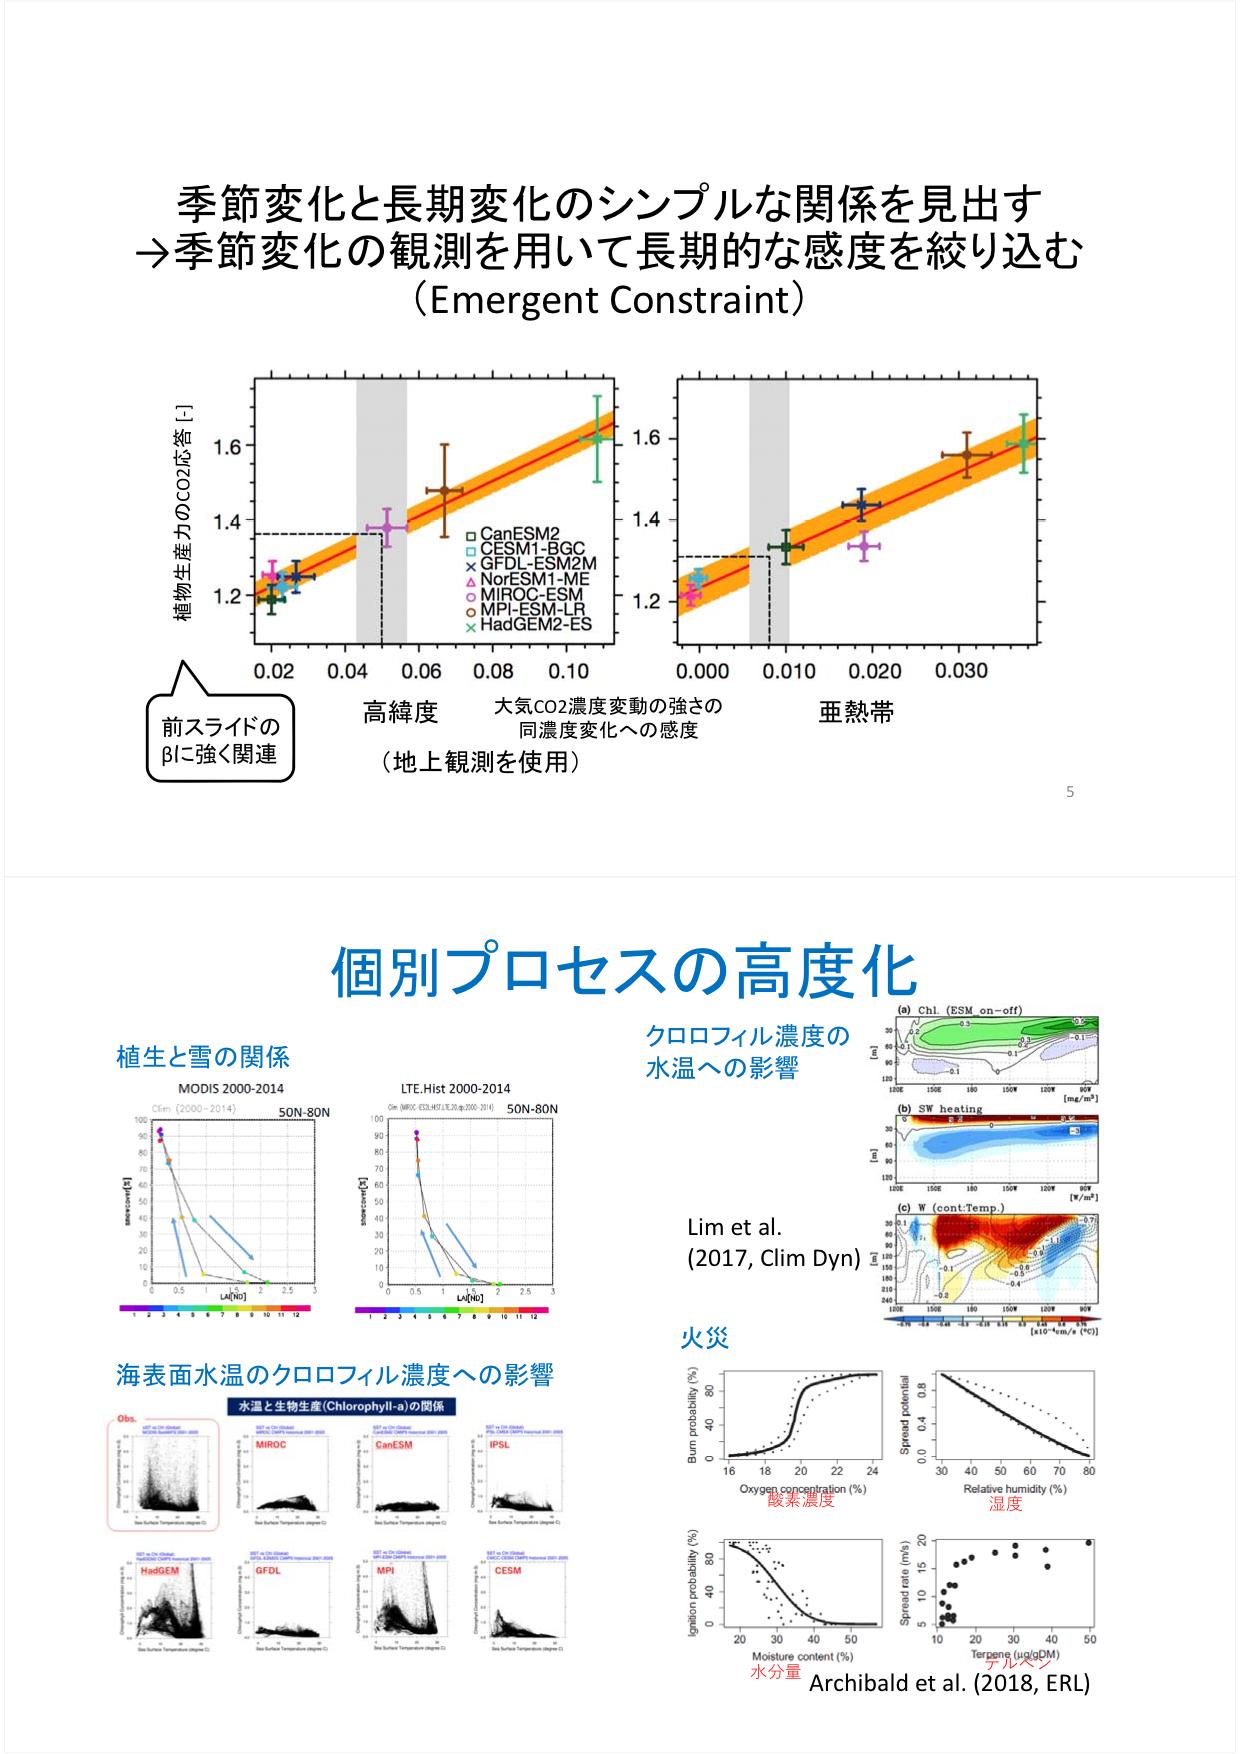 f:id:Imamura:20181220152521p:plain